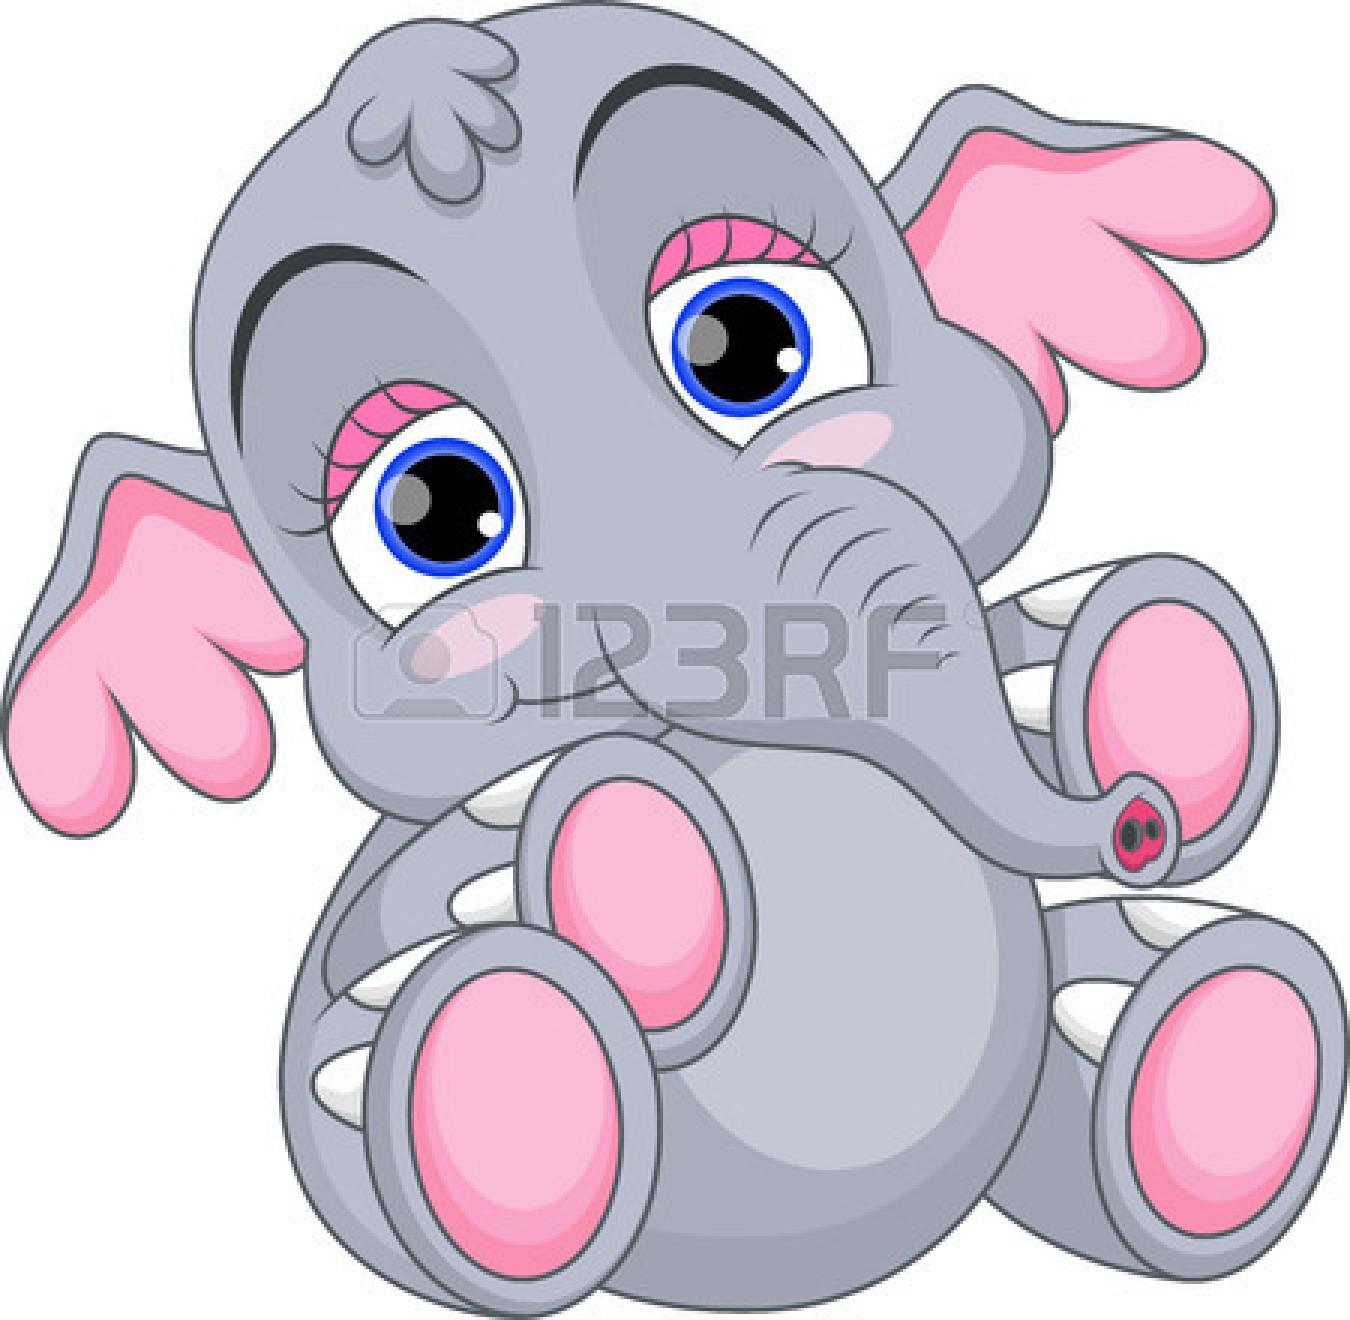 1350x1320 Cute Baby Elephant Cartoon Elephant Baby Elephants